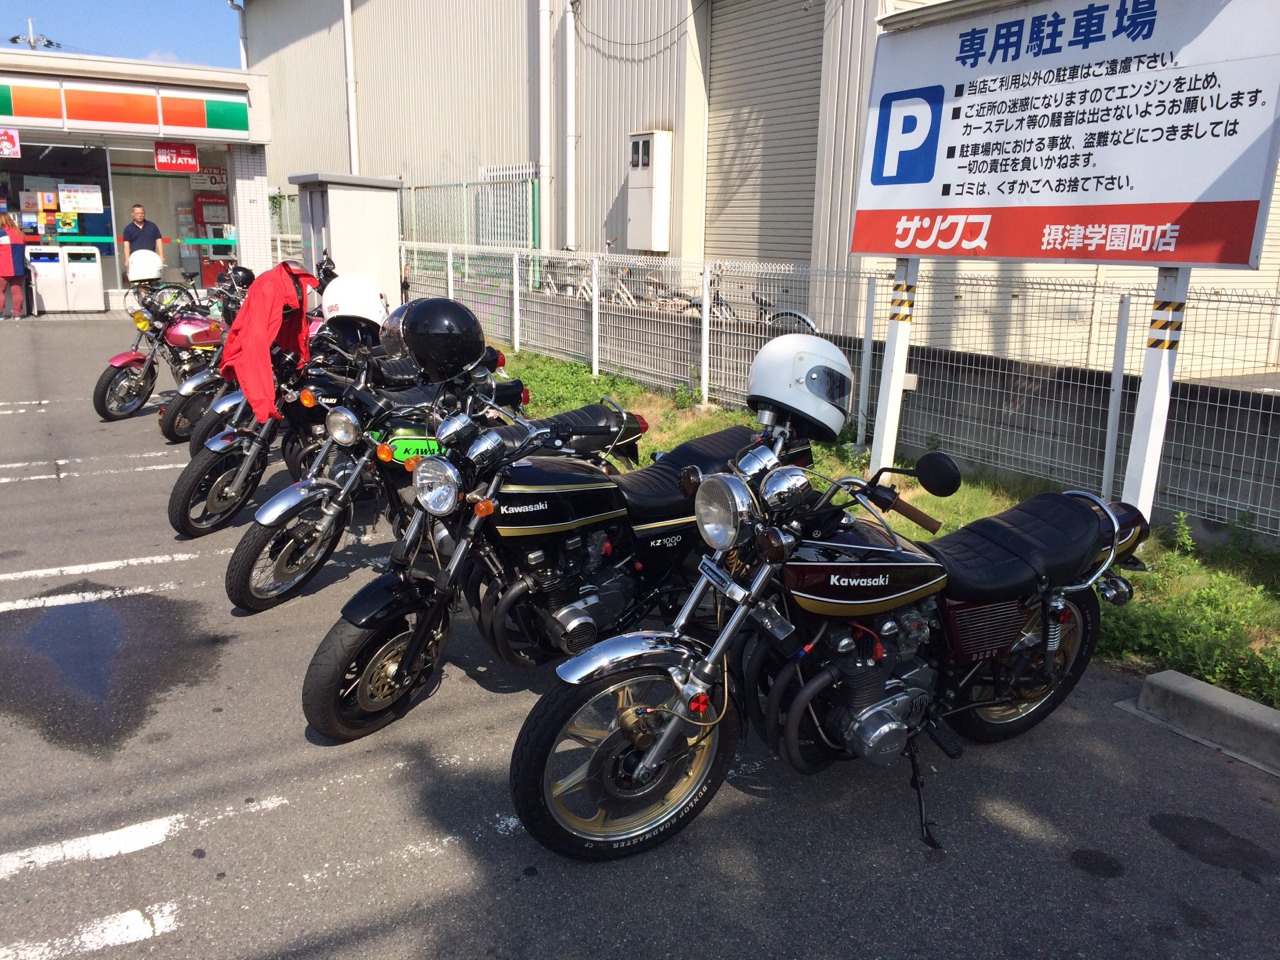 S__5316912.jpg